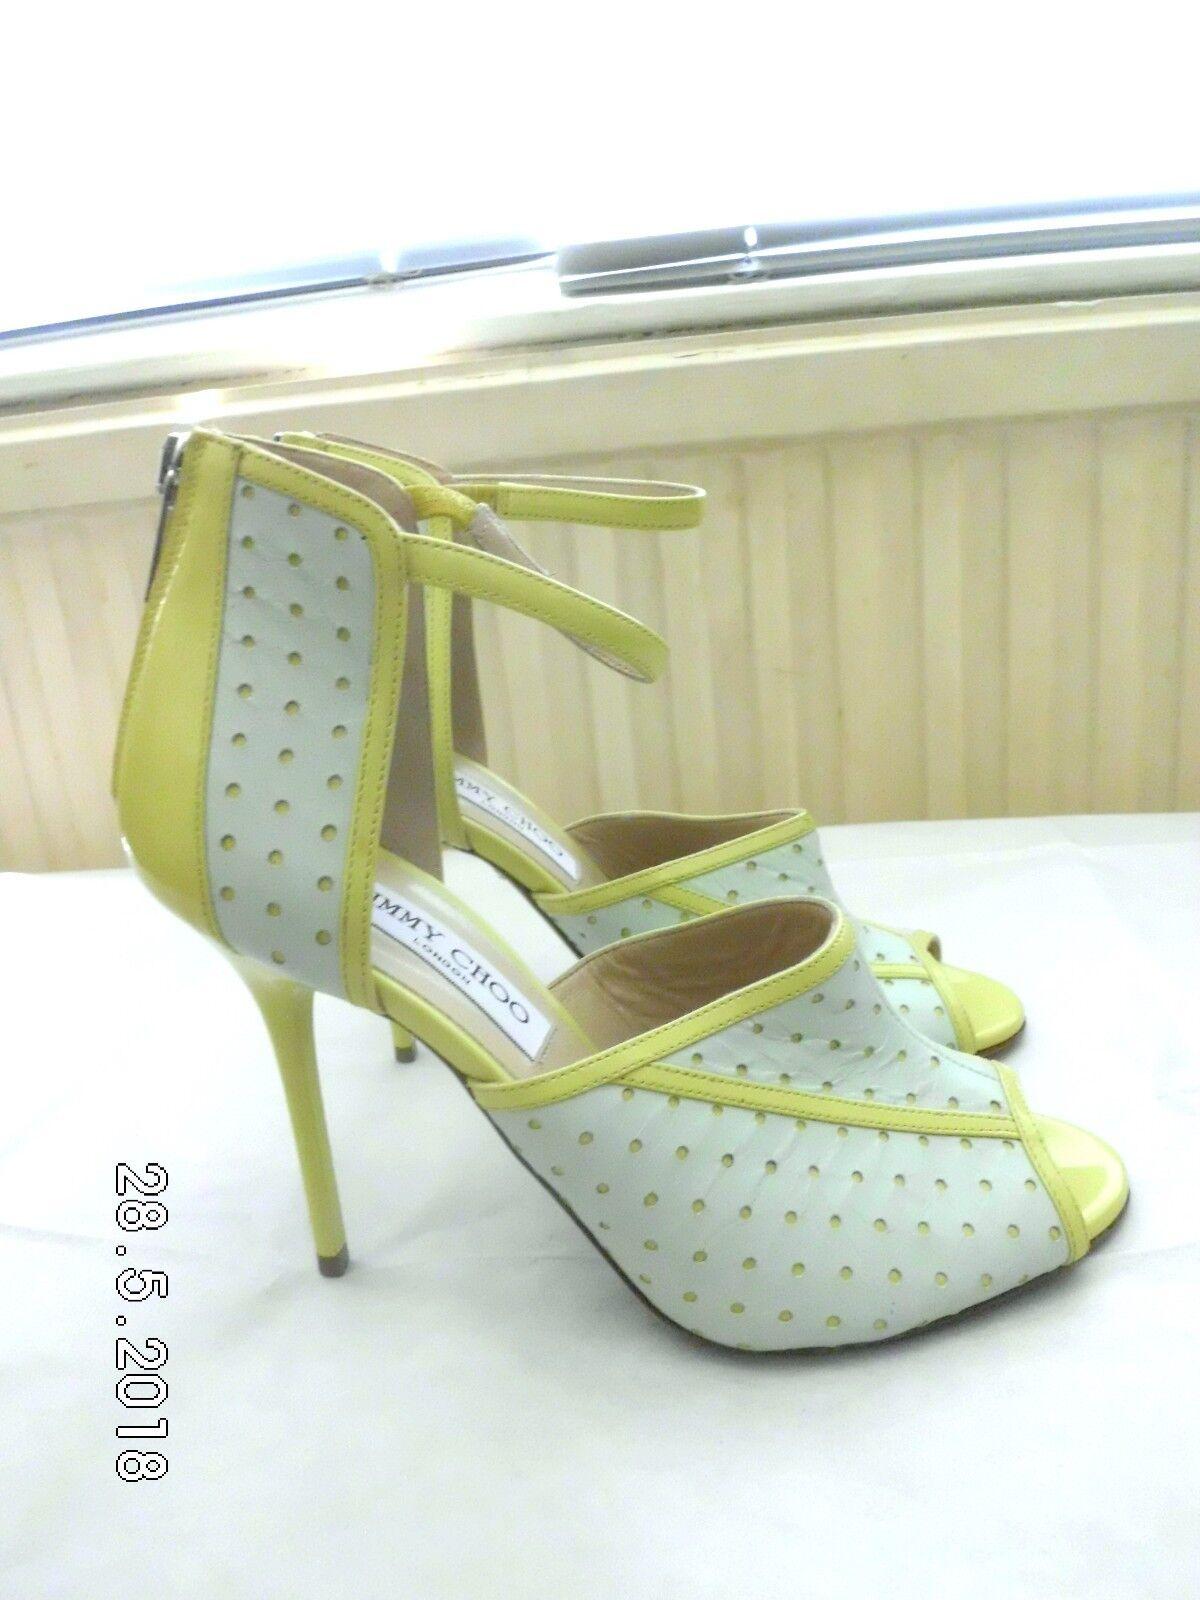 Jimmy Choo RARE ankle strap Heeled 2 colour Sandales Größe UK 4  EU 37 US 7